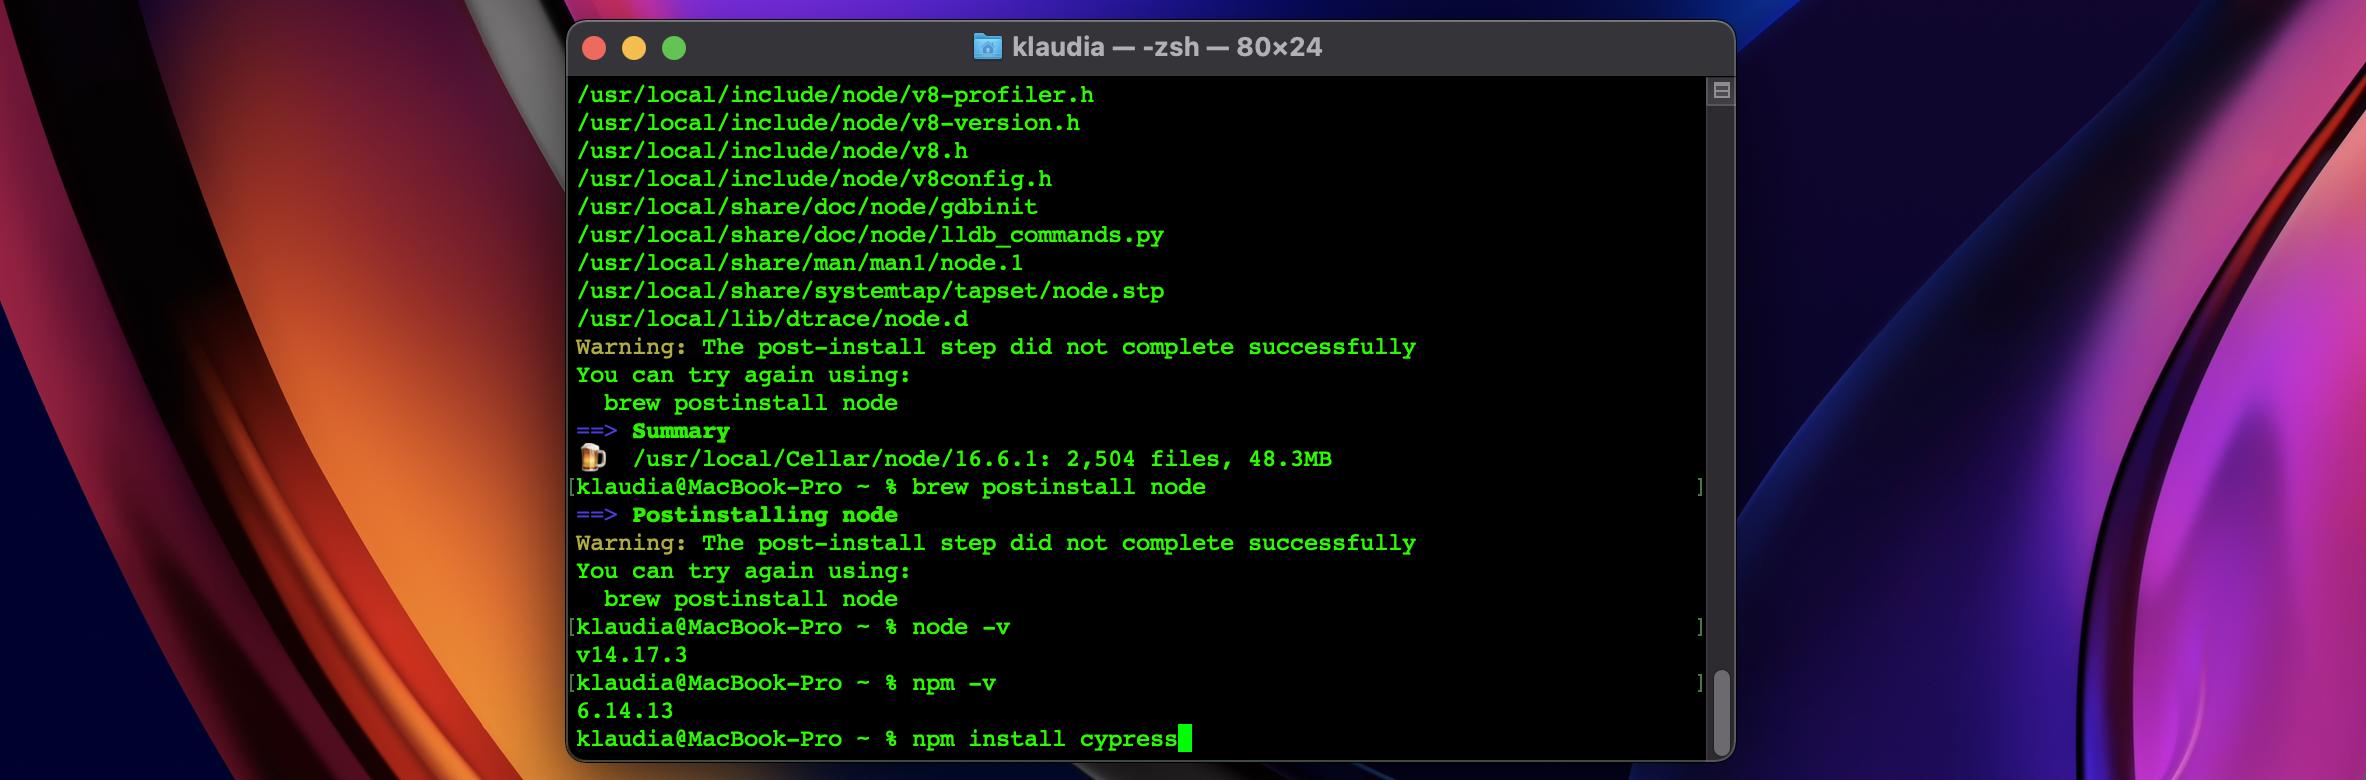 npm install cypress command